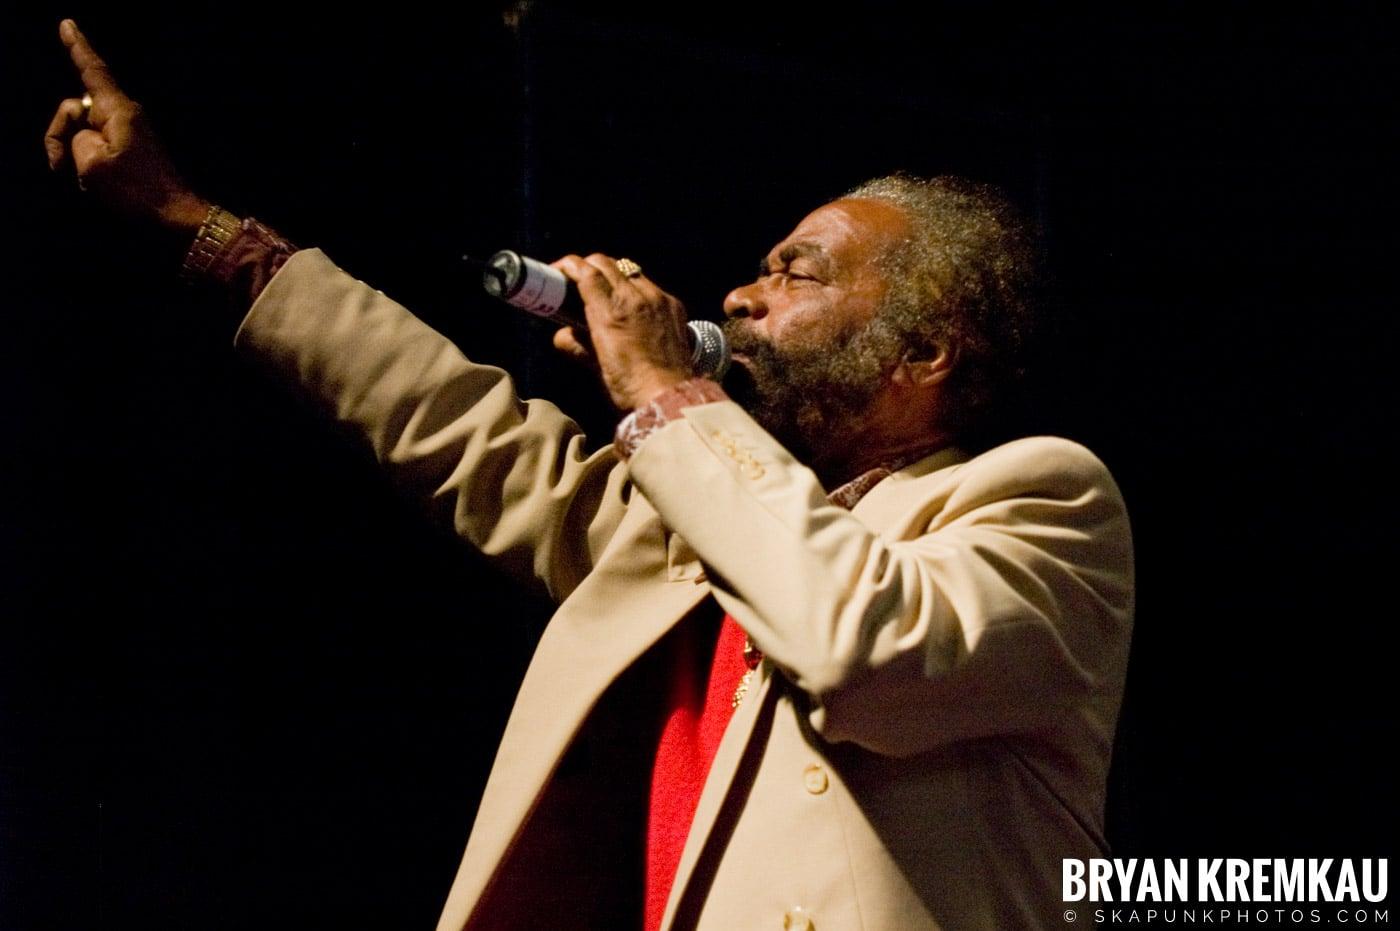 John Holt @ Vintage Reggae Fest - Hammerstein Ballroom, NYC - 12.16.07 (3)